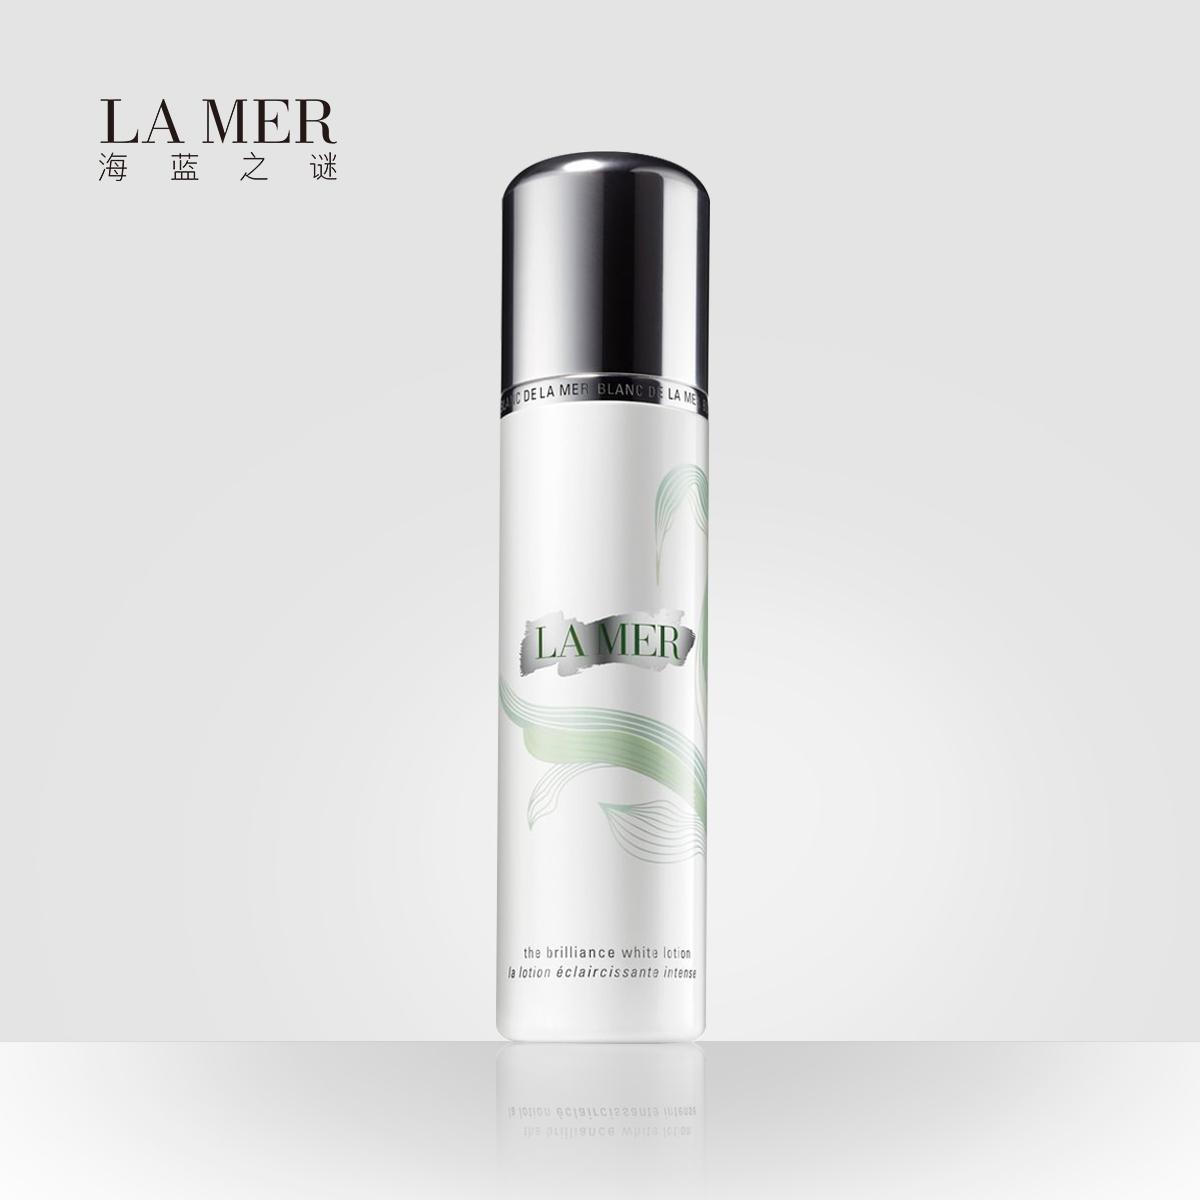 LA MER海蓝之谜焕白璀璨柔肤水200ml 舒缓褪淡